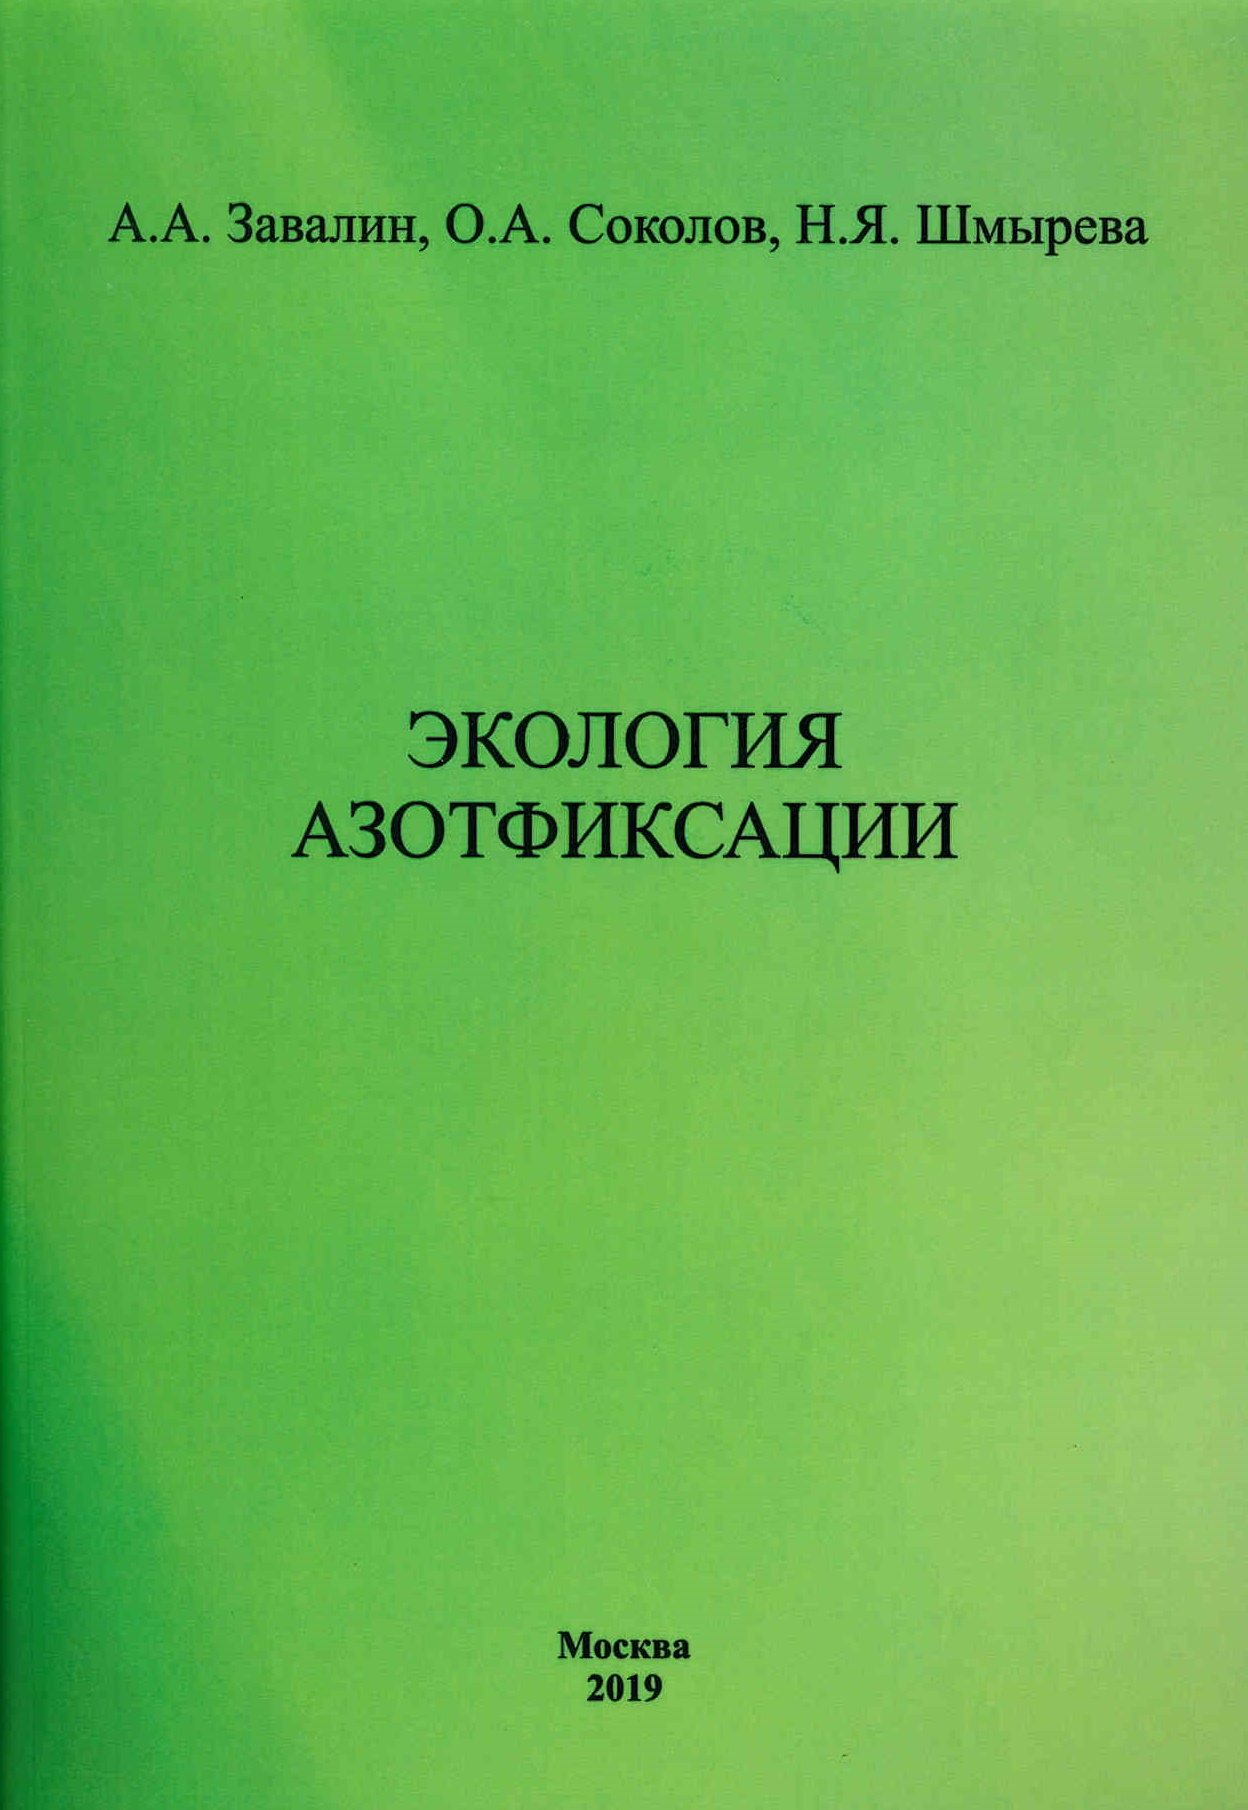 Экология азотфиксации - фото